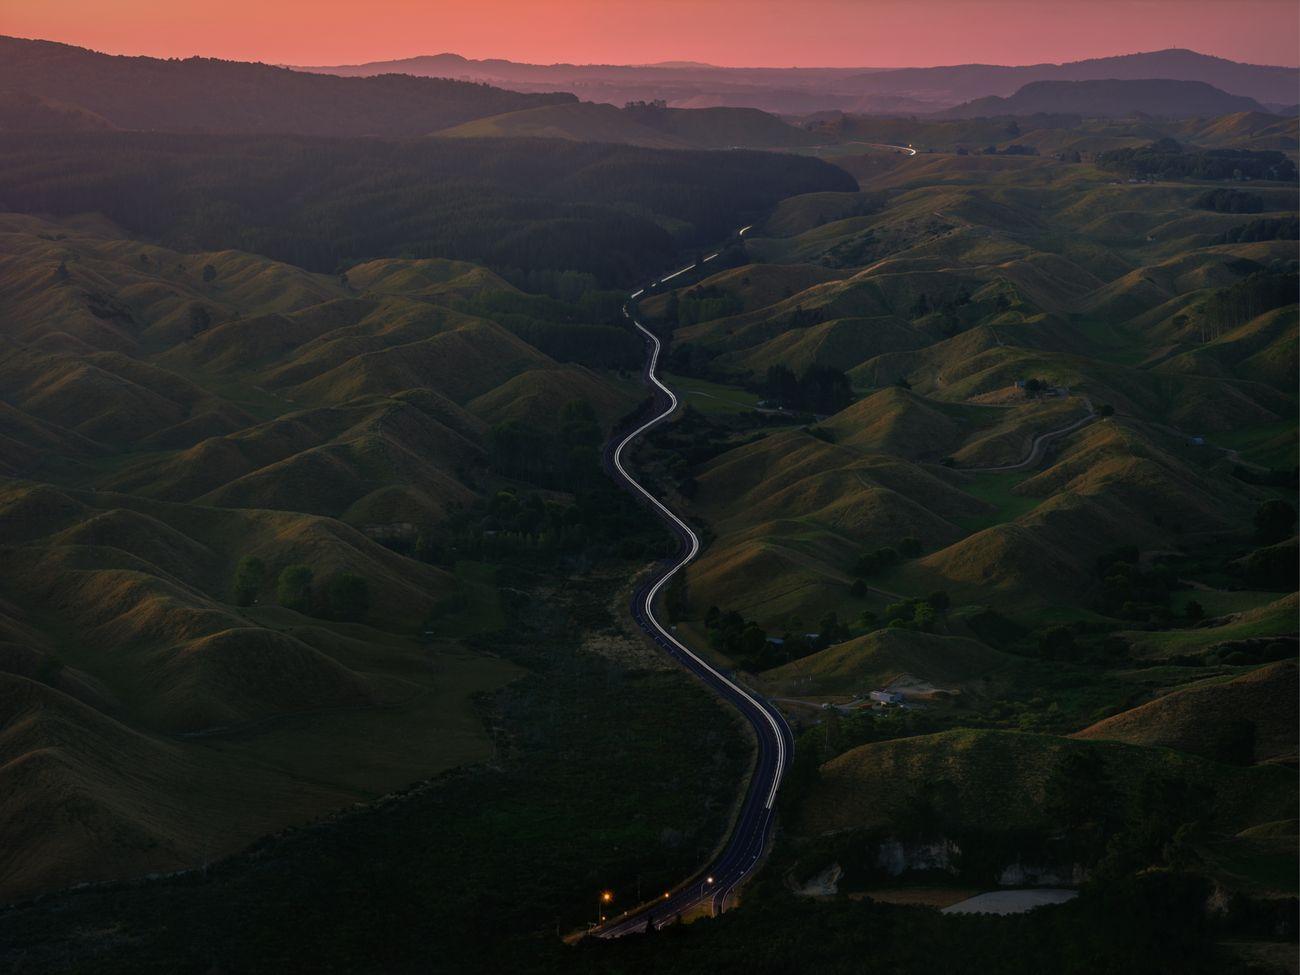 New Zealand Landscape Photography: Best Spots To Photograph